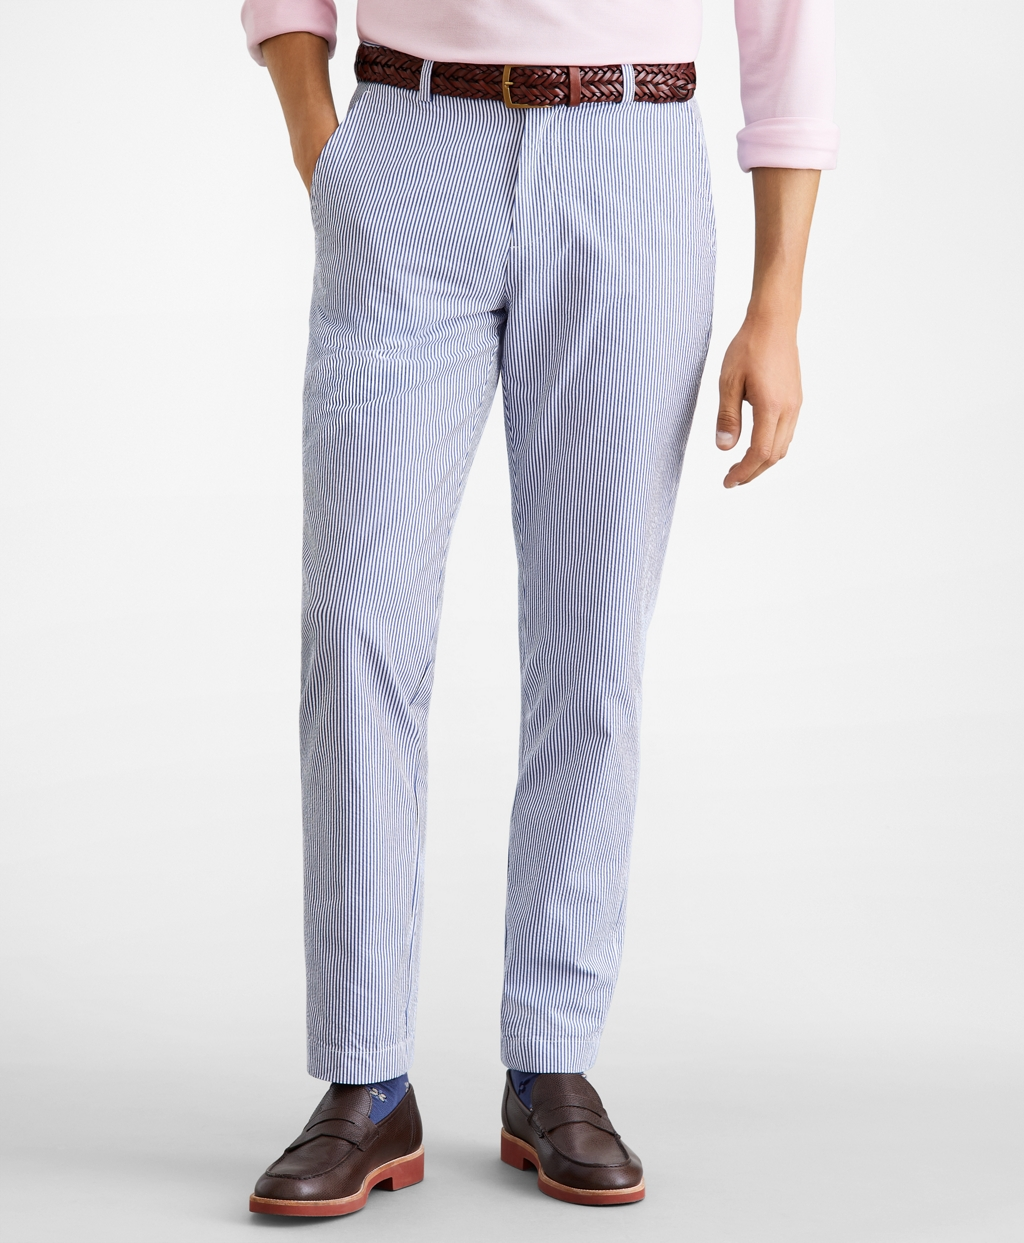 1920s Men's Pants, Trousers, Plus Fours, Knickers Brooks Brothers Mens Extra Slim Fit Stripe Seersucker Pants $49.25 AT vintagedancer.com